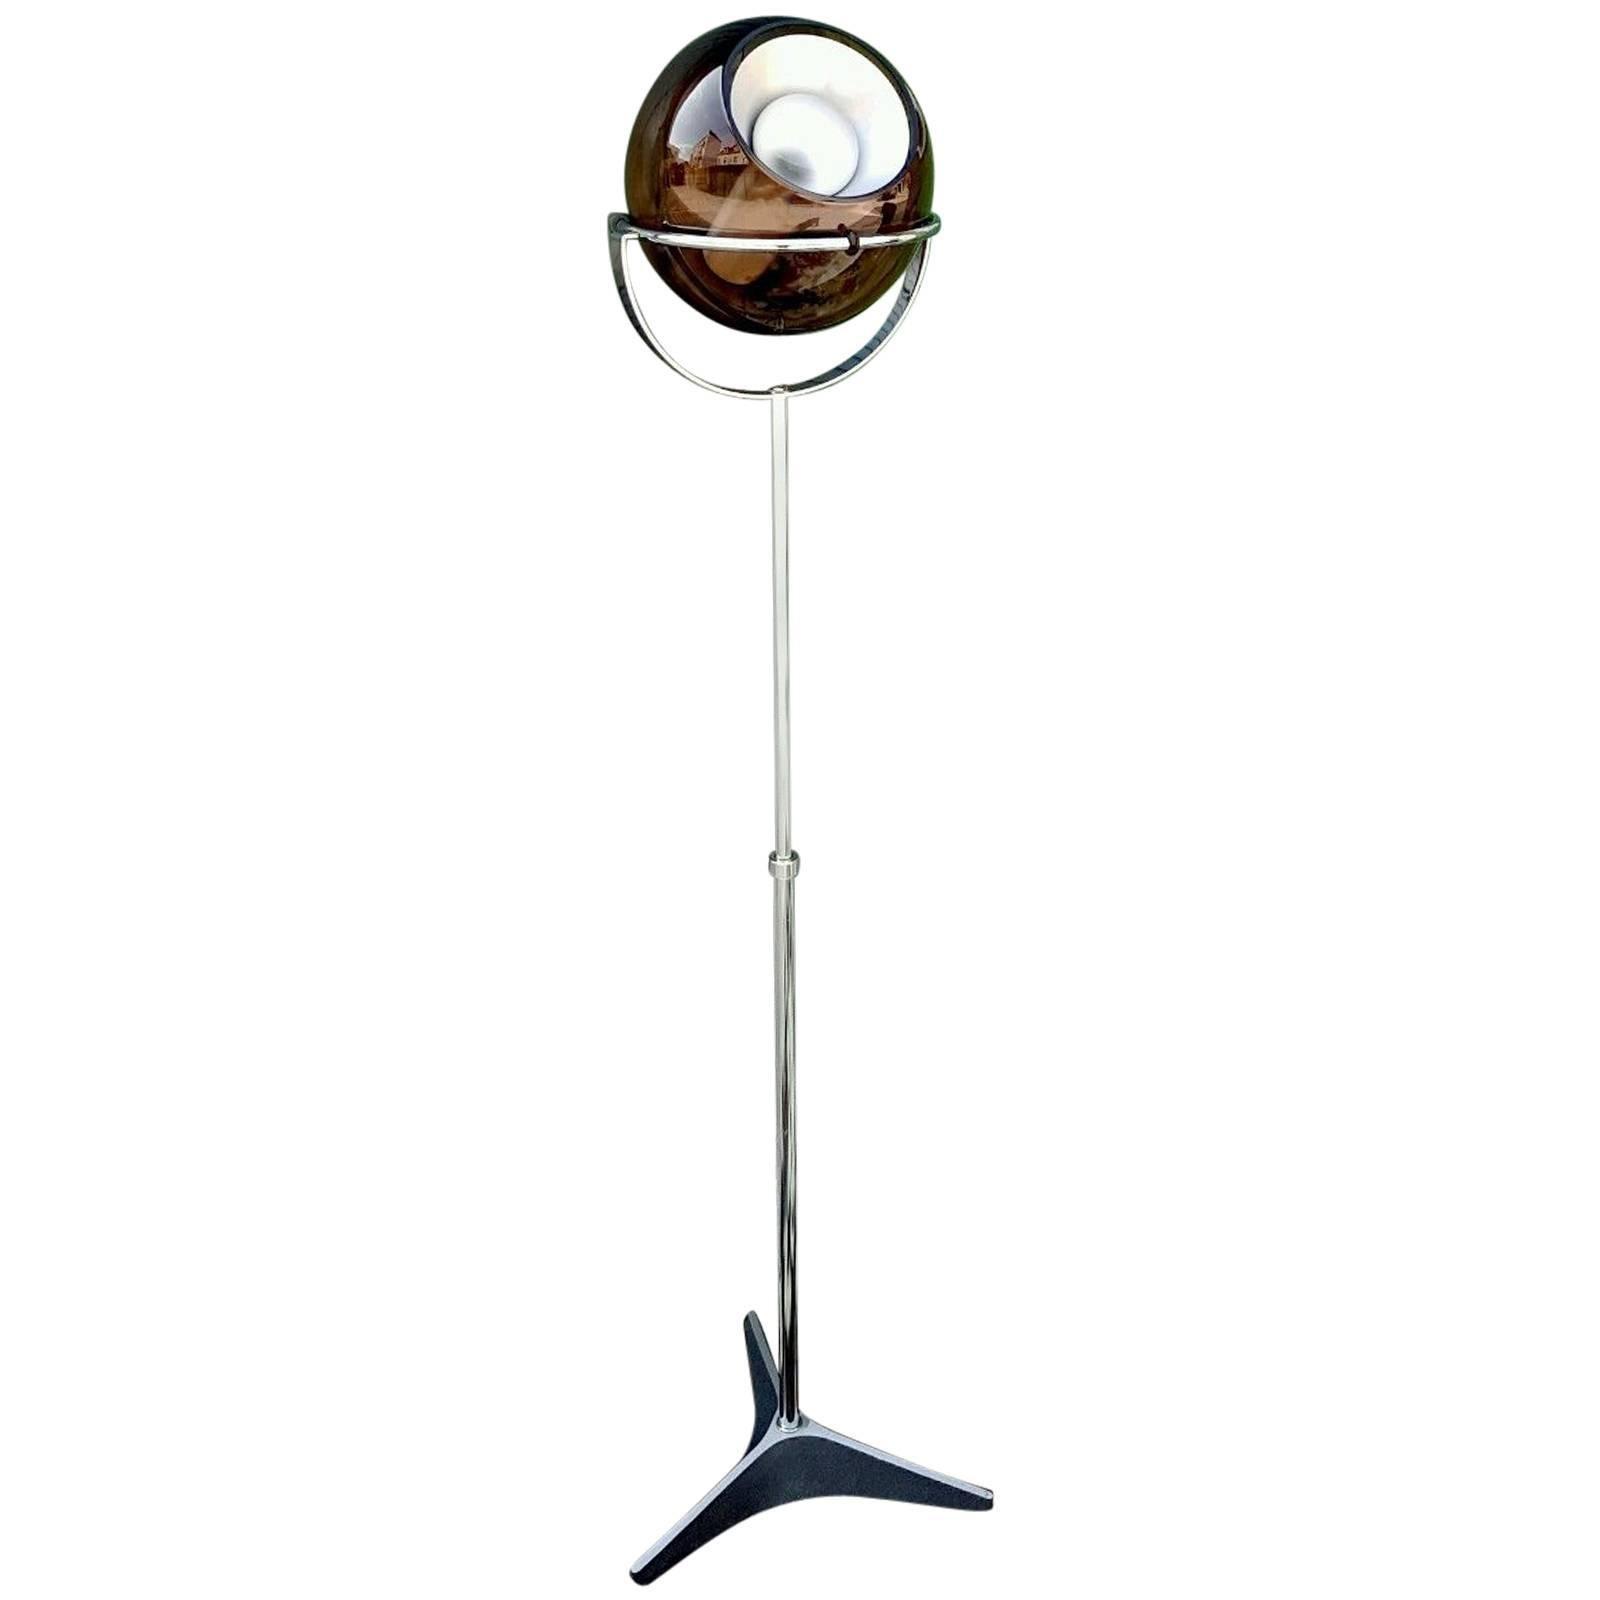 Rare Adjustable Floor Lamp by Frank Ligtelijn for RAAK of Amsterdam, circa 1960